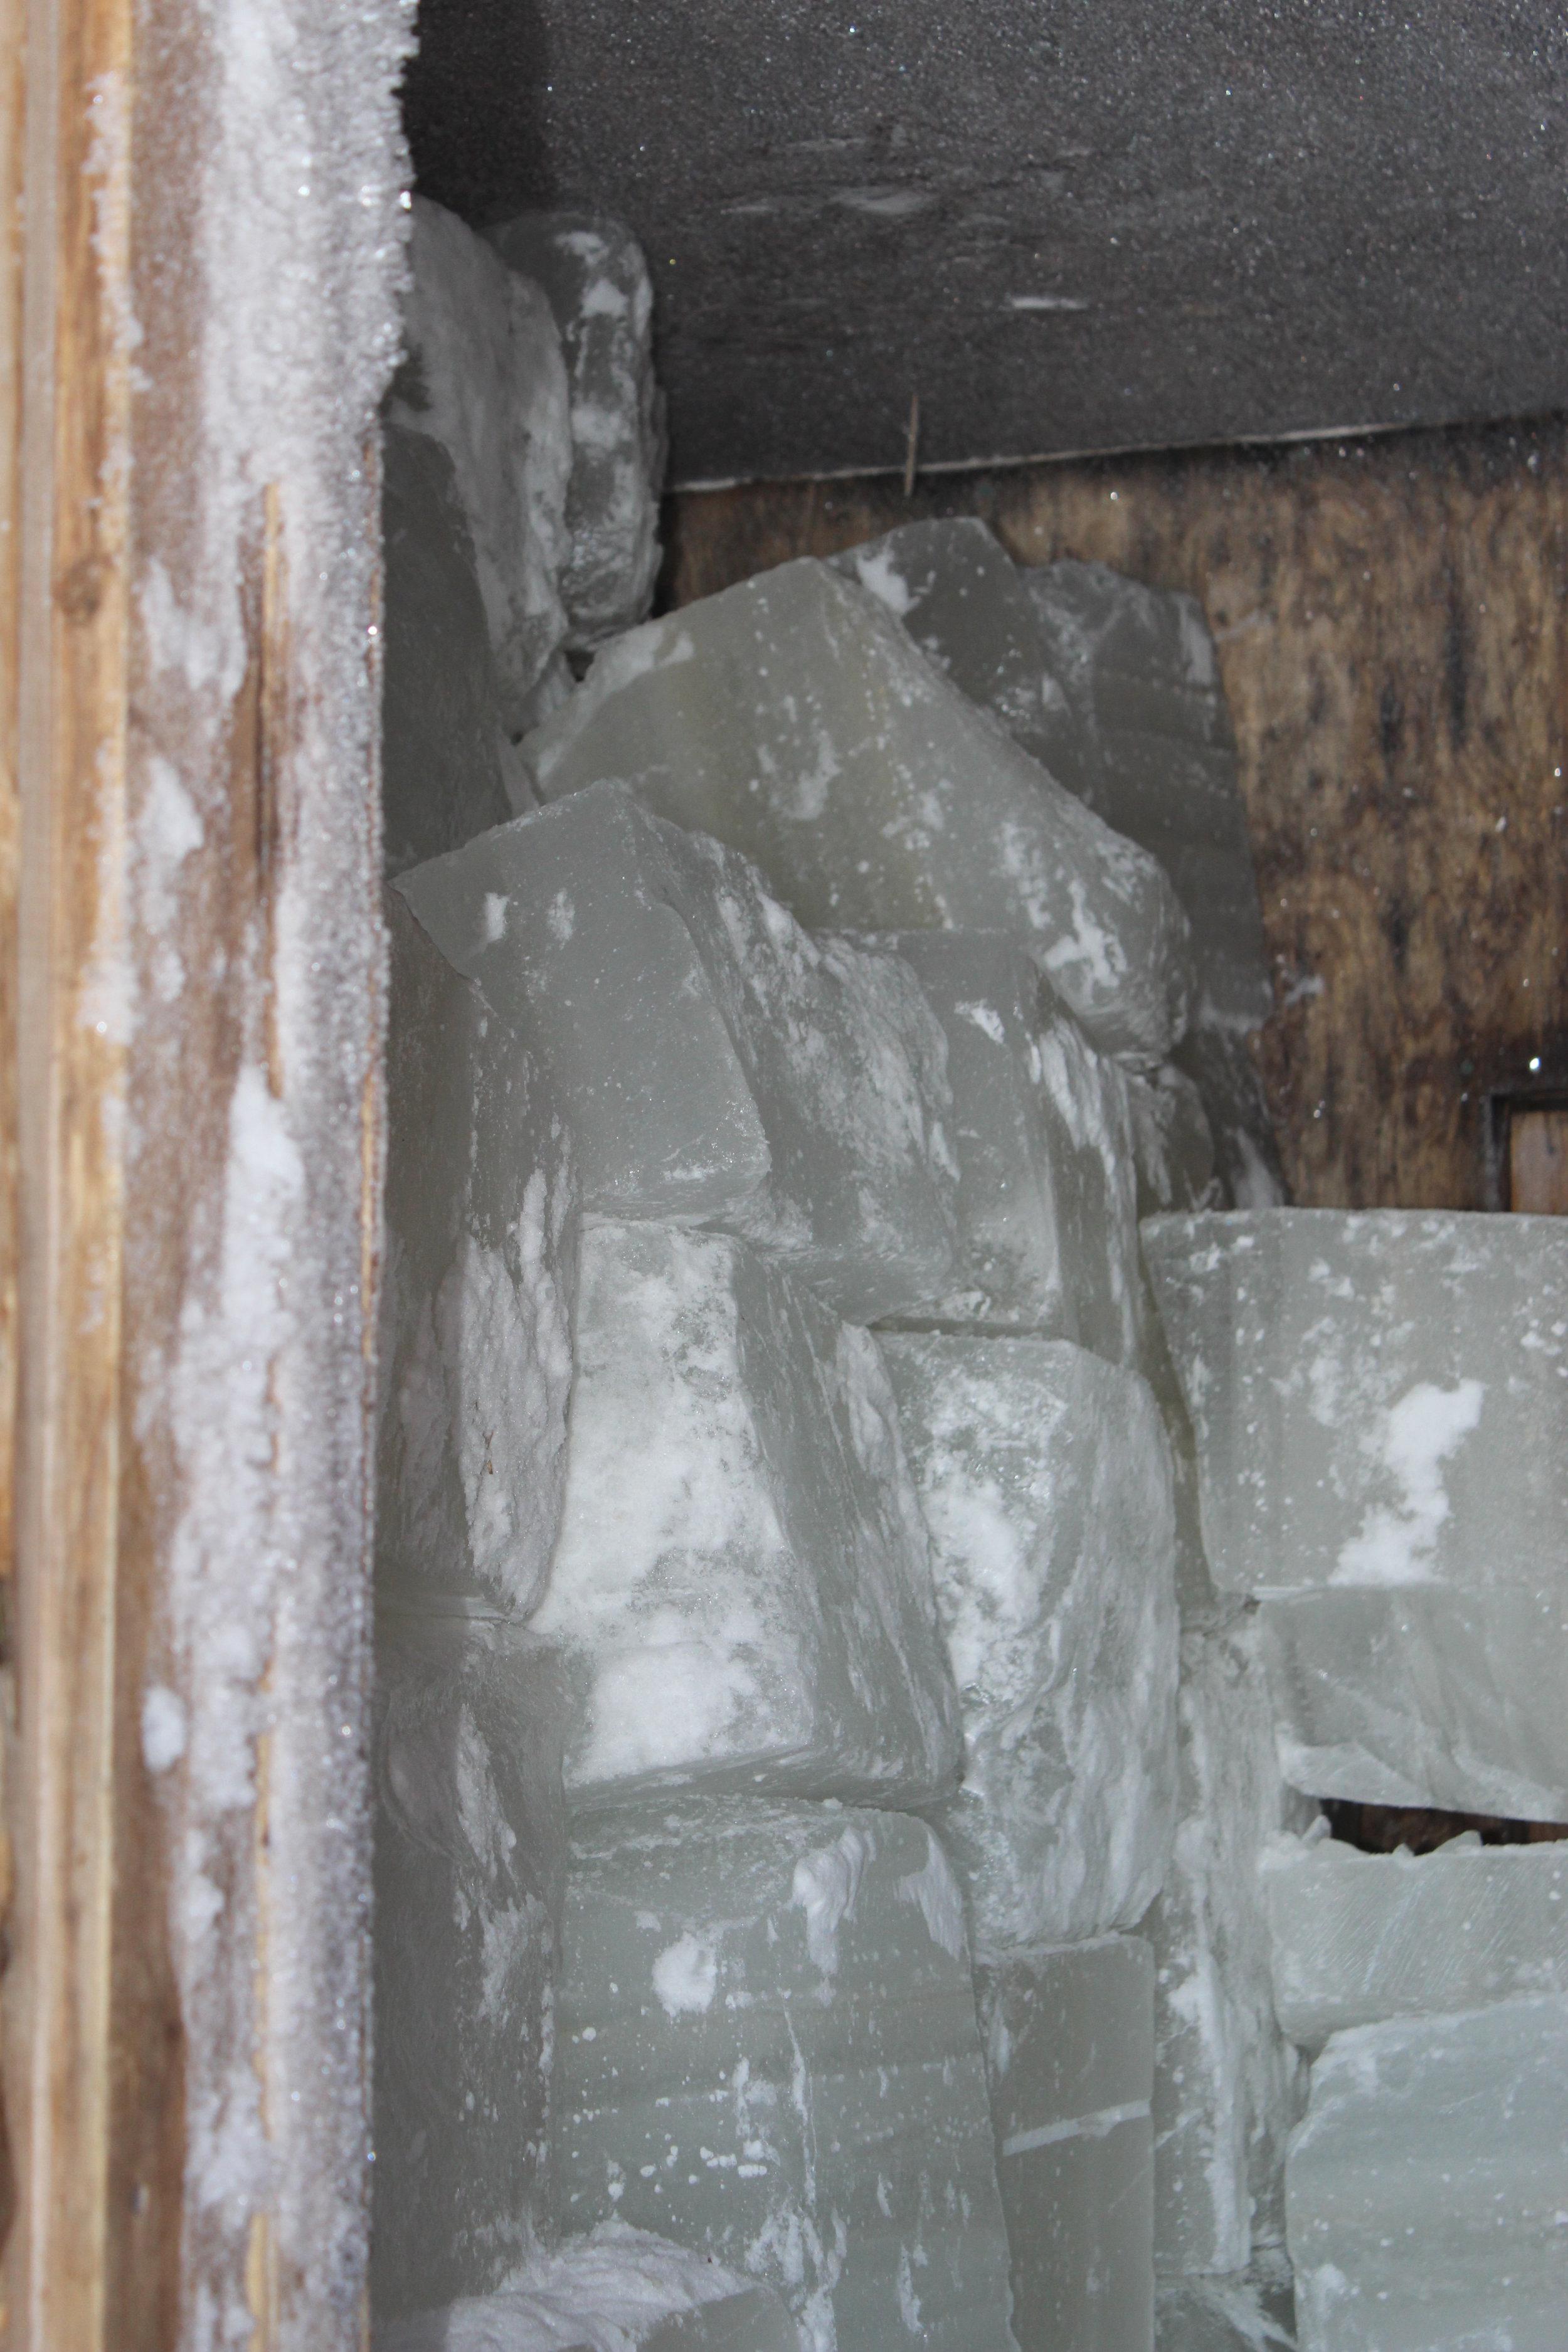 ice inside old style ice house.JPG